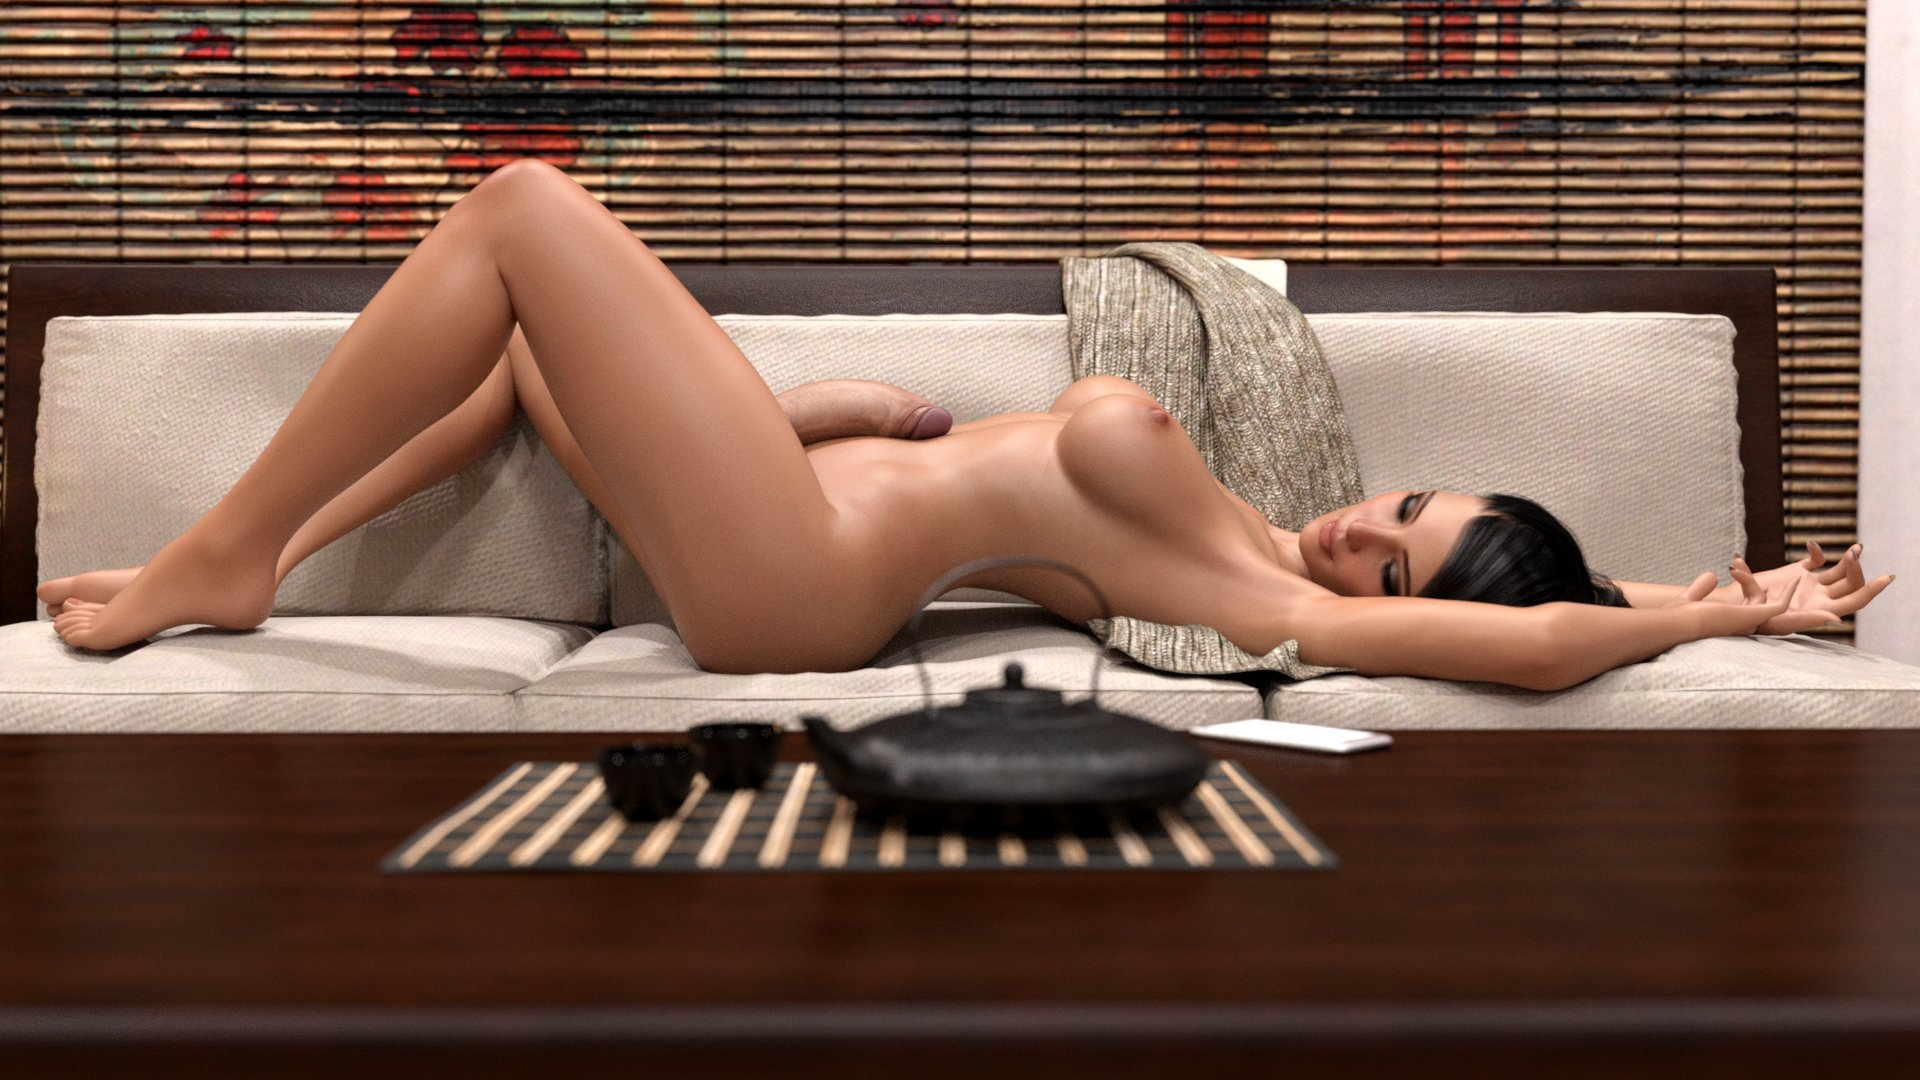 Interactive nude girl